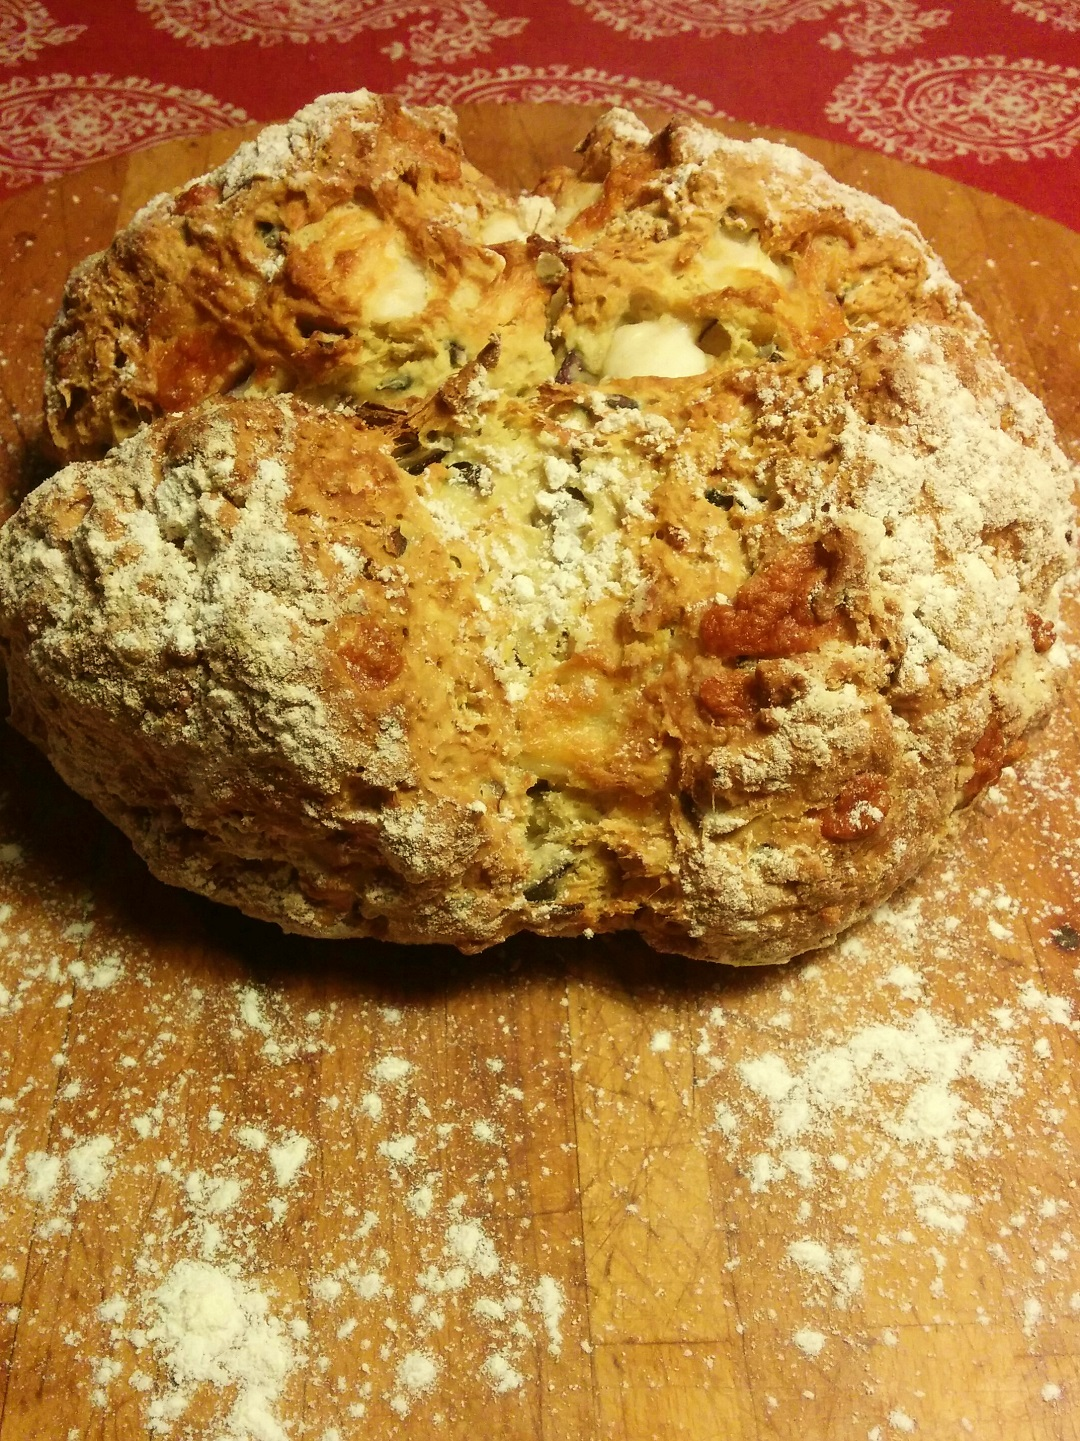 the-bake-off-bake-along-week-3-bread-20